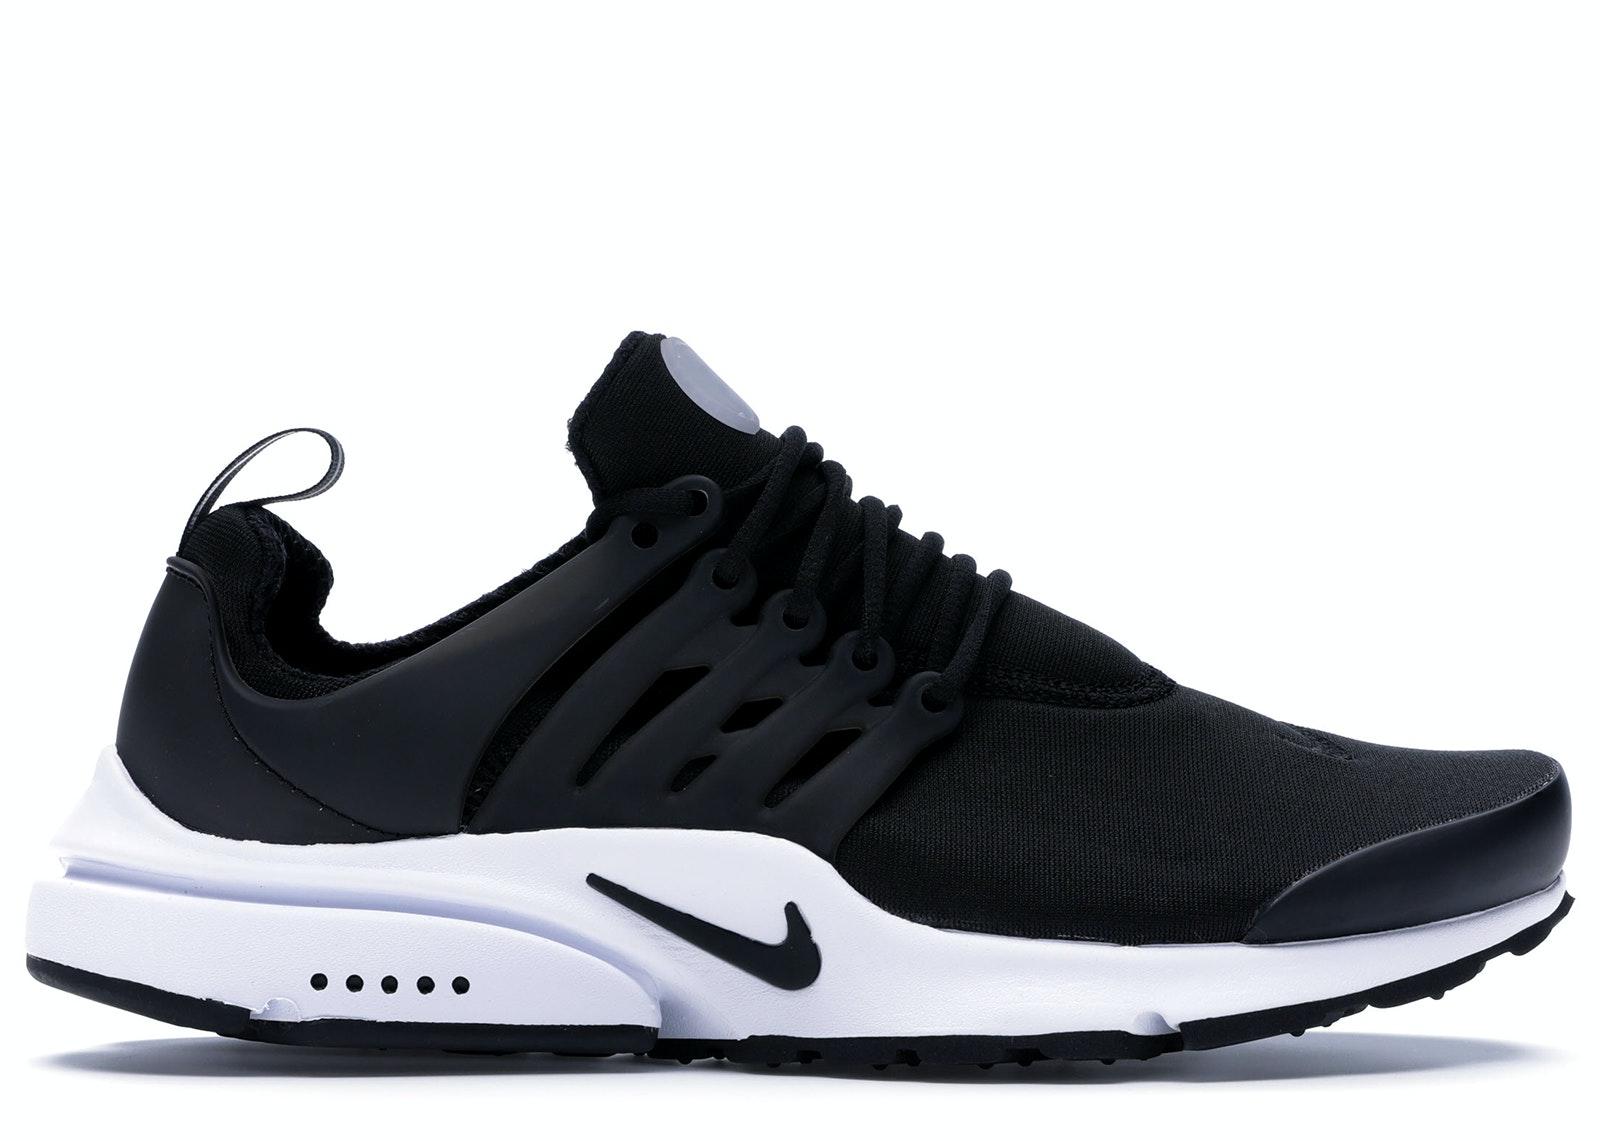 Nike Air Presto Essential Black/Black-White